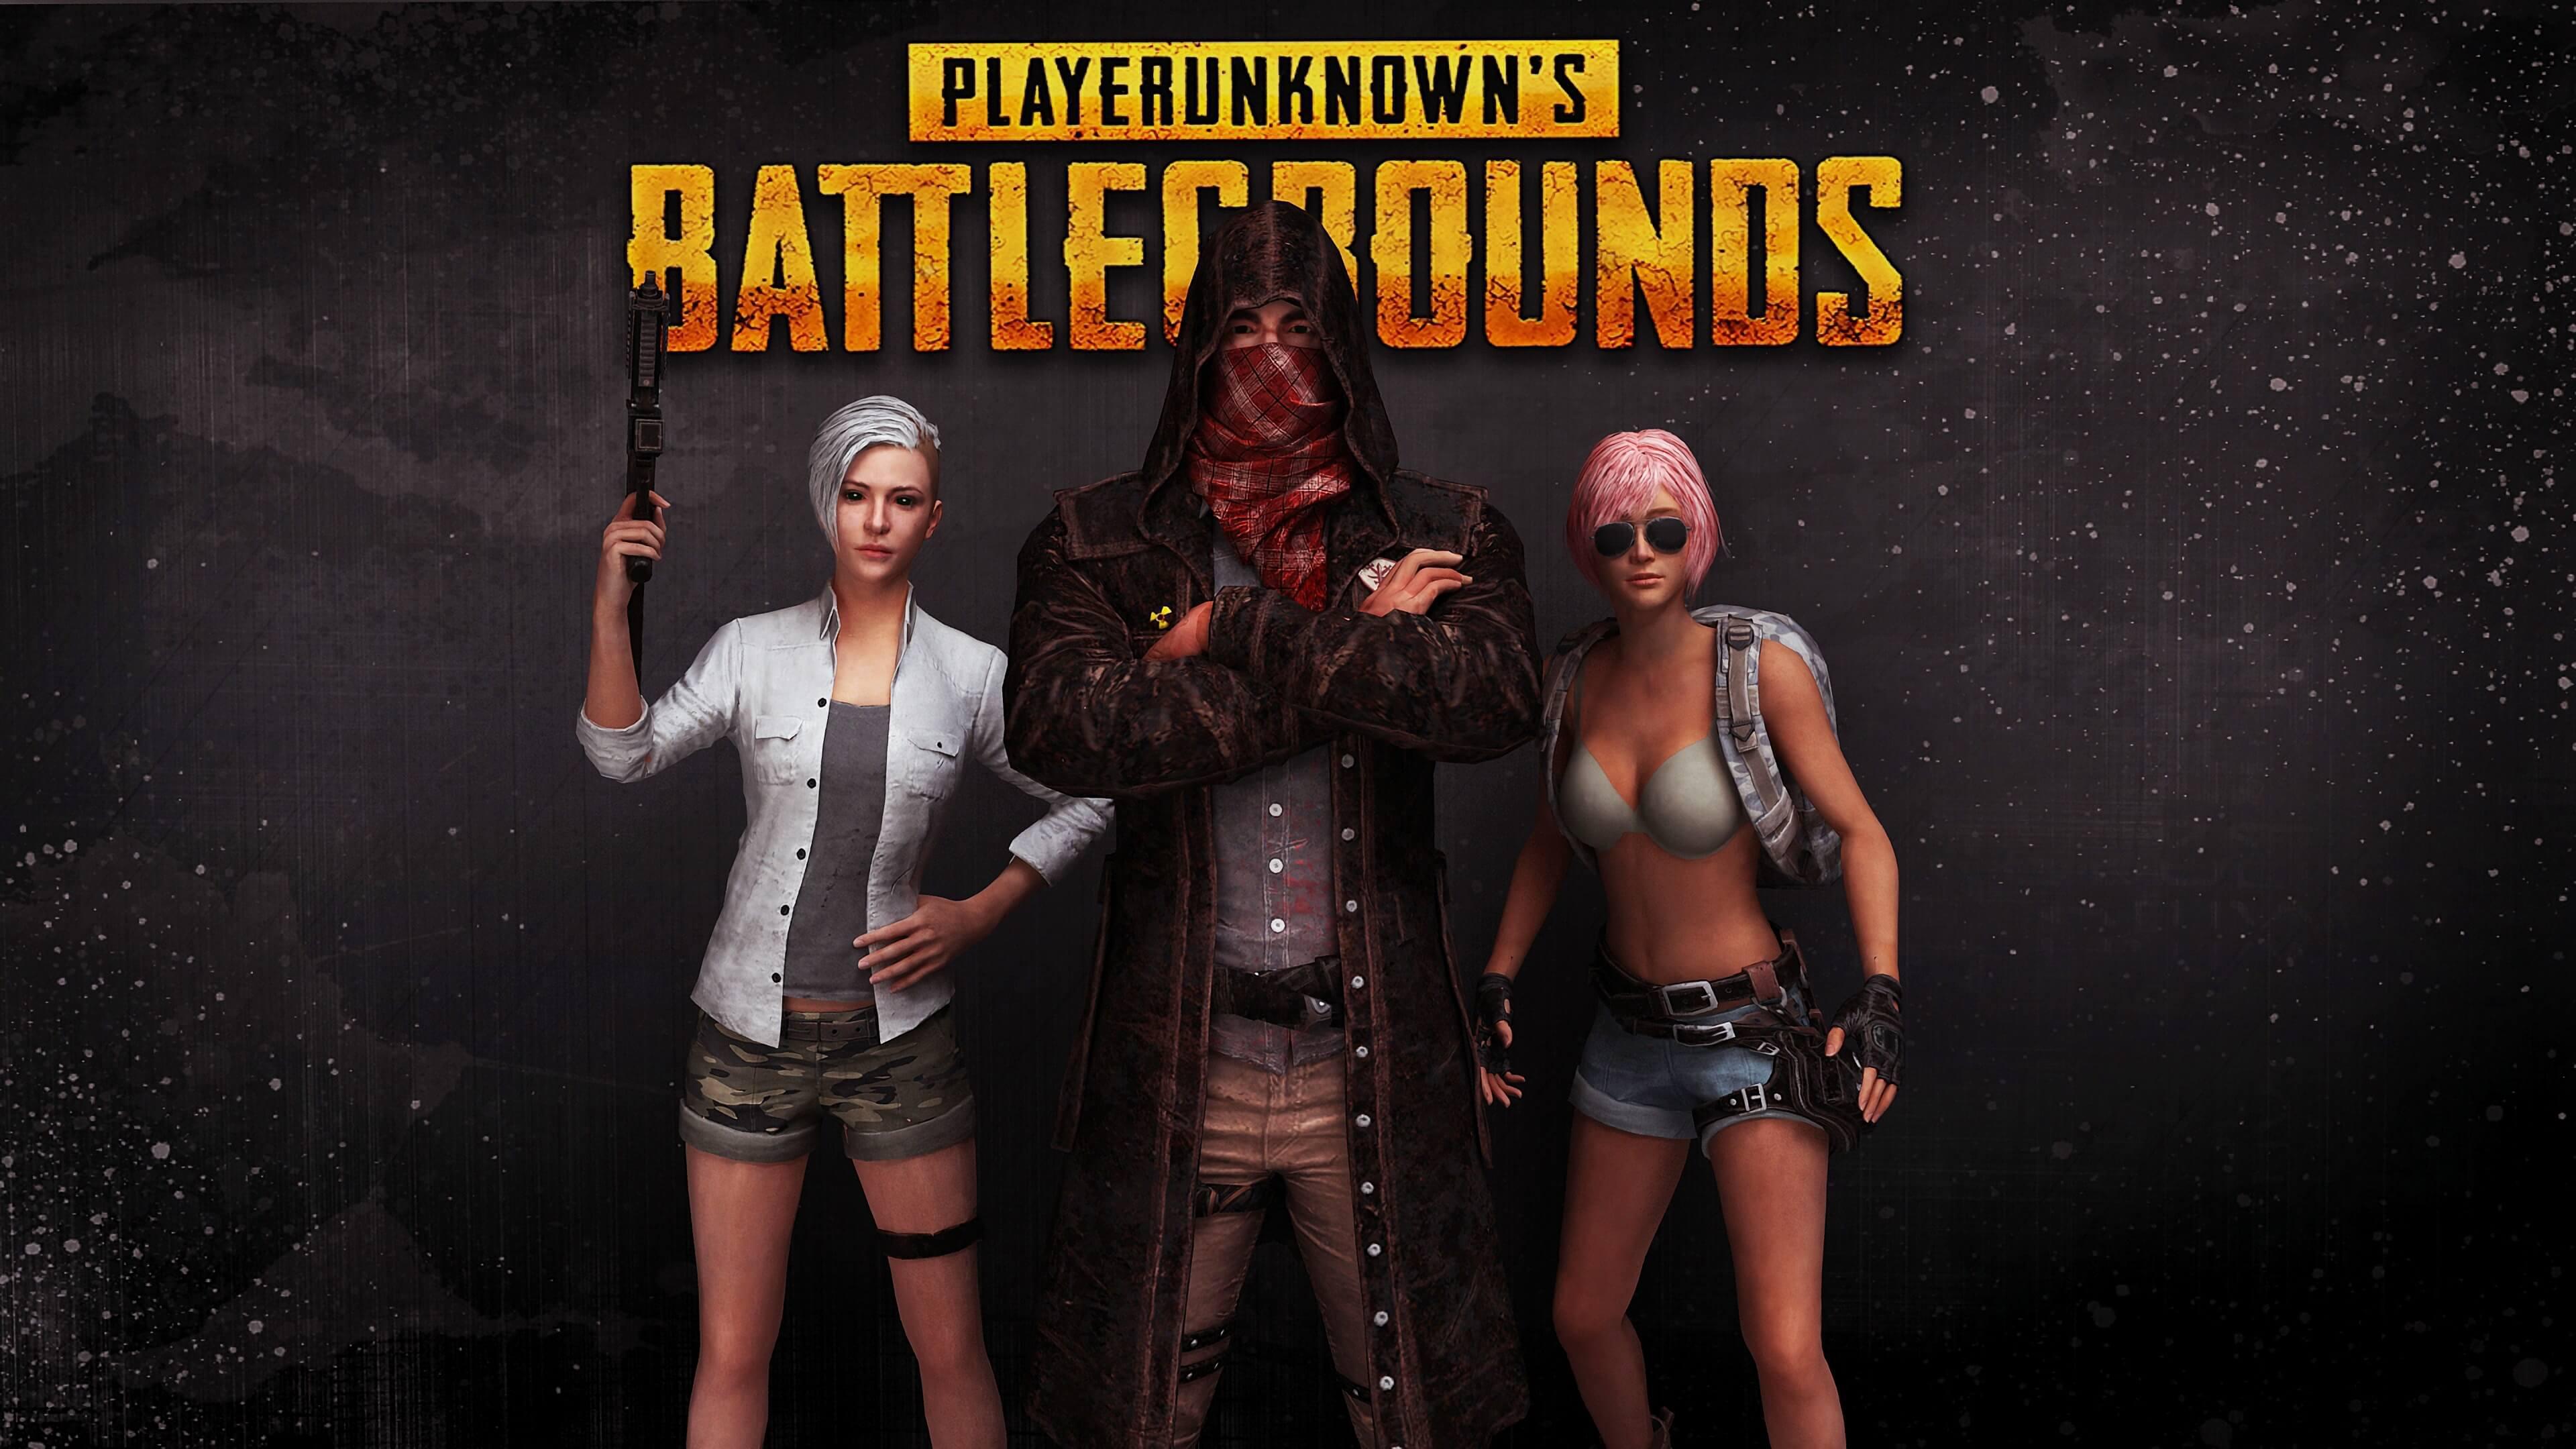 Обои PlayerUnknown's Battlegrounds мжж